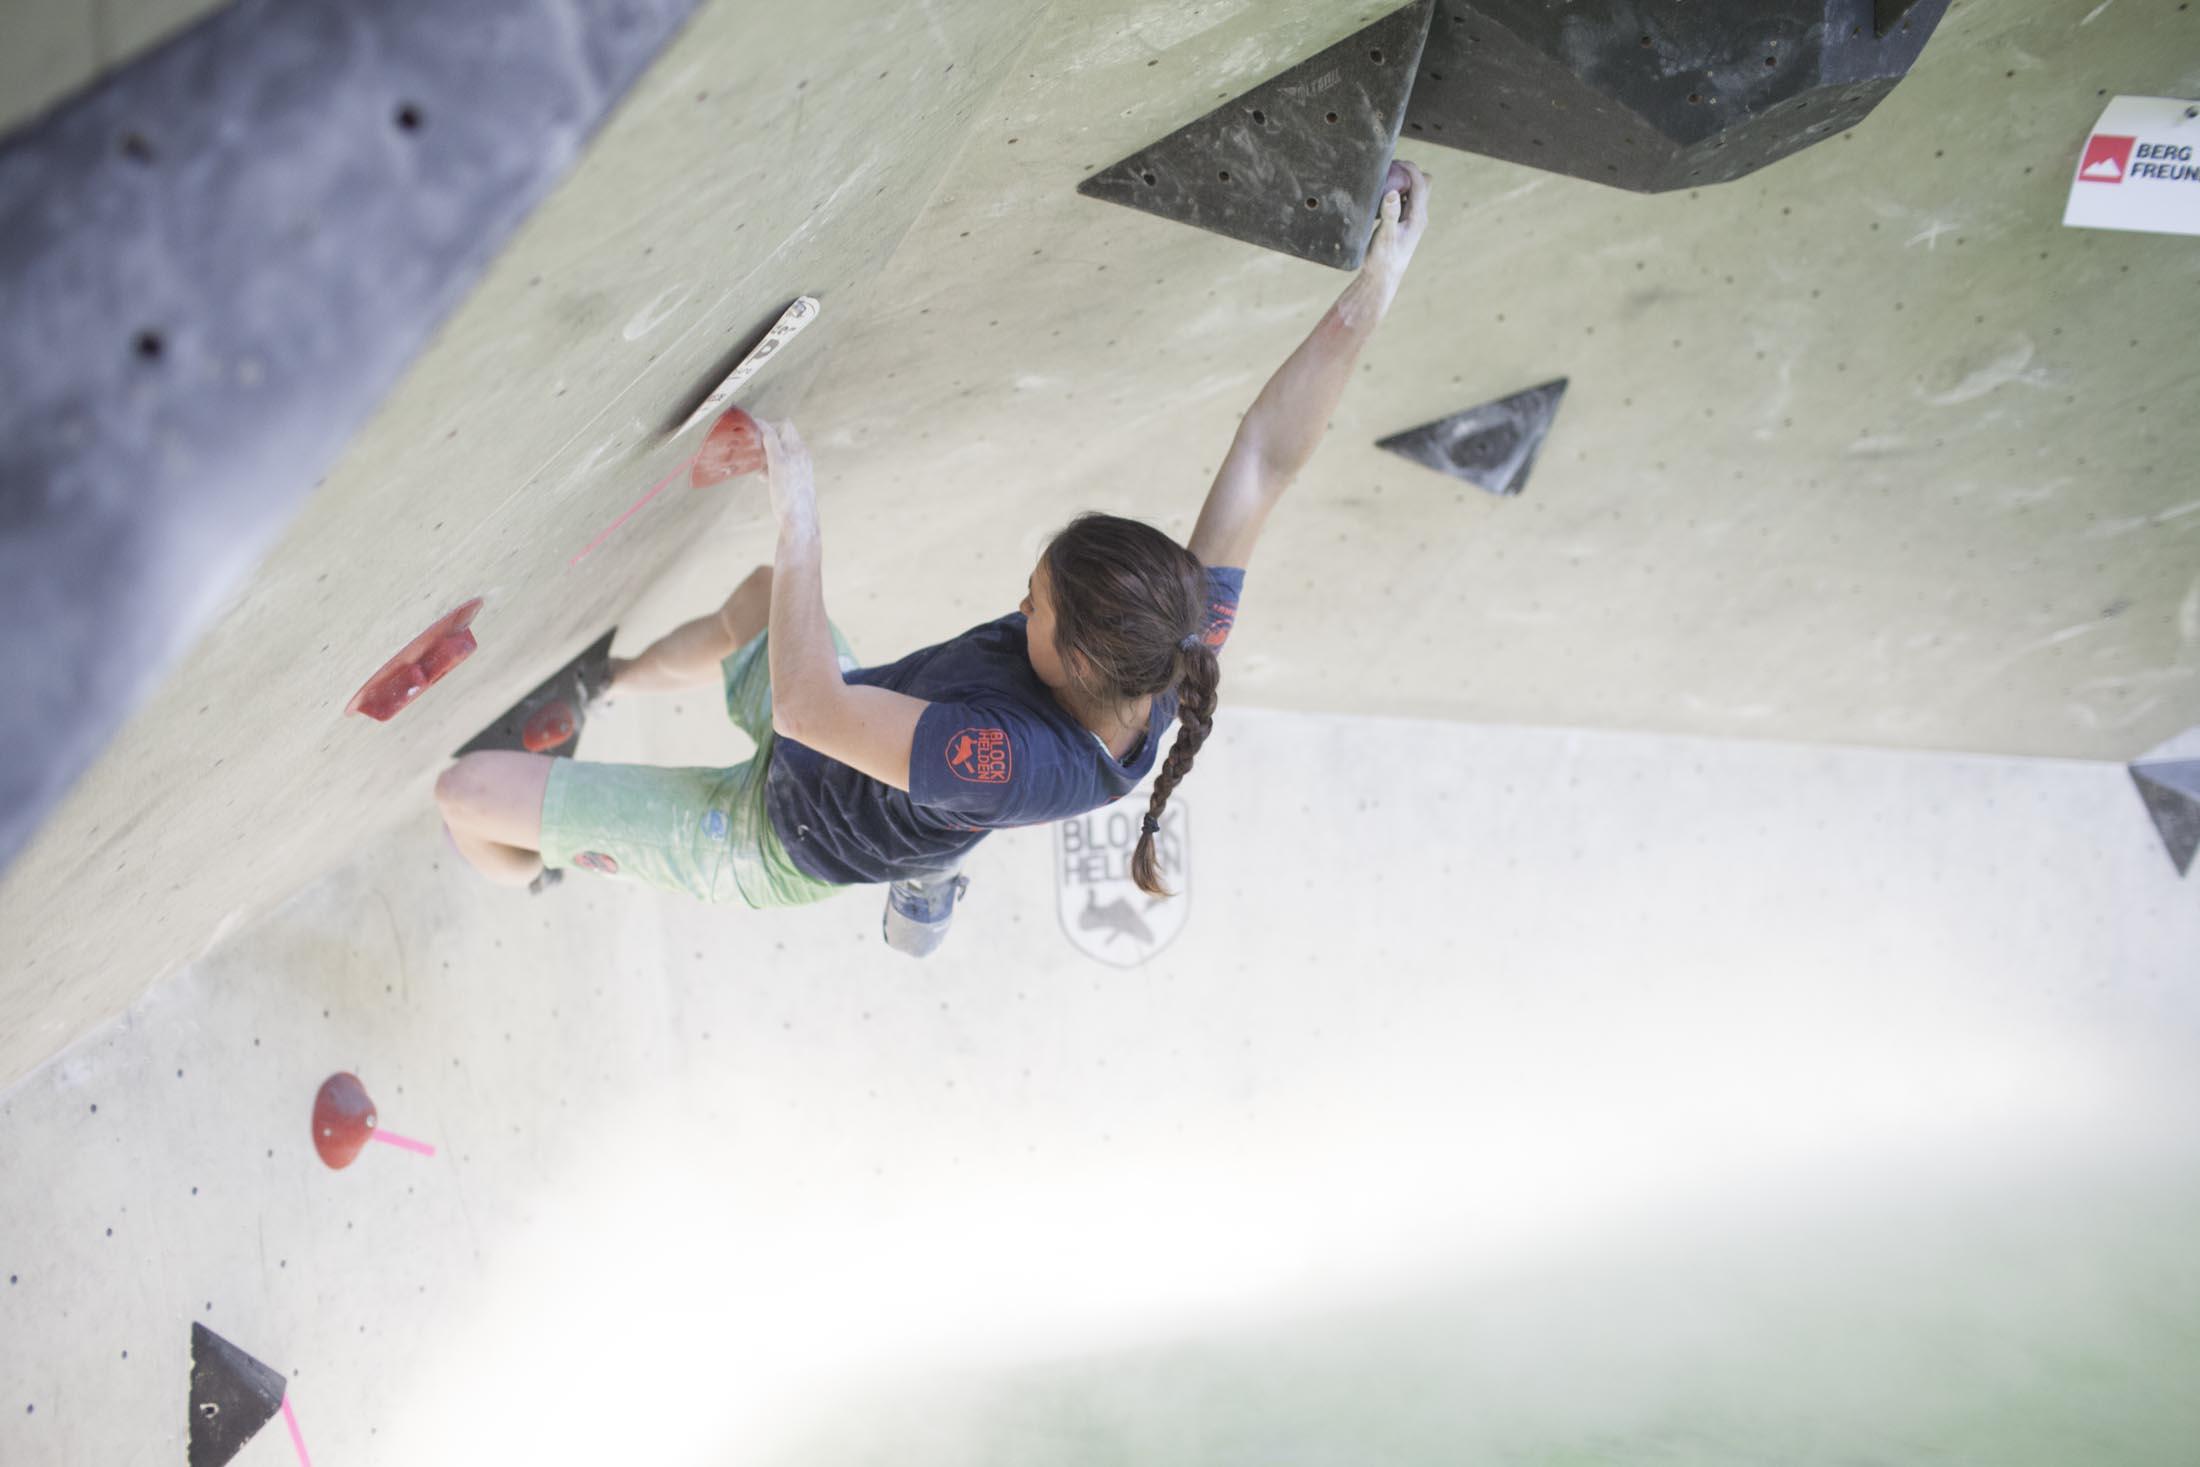 Finale, internationaler bouldercup Frankenjura 2016, BLOCKHELDEN Erlangen, Mammut, Bergfreunde.de, Boulderwettkampf07092016689